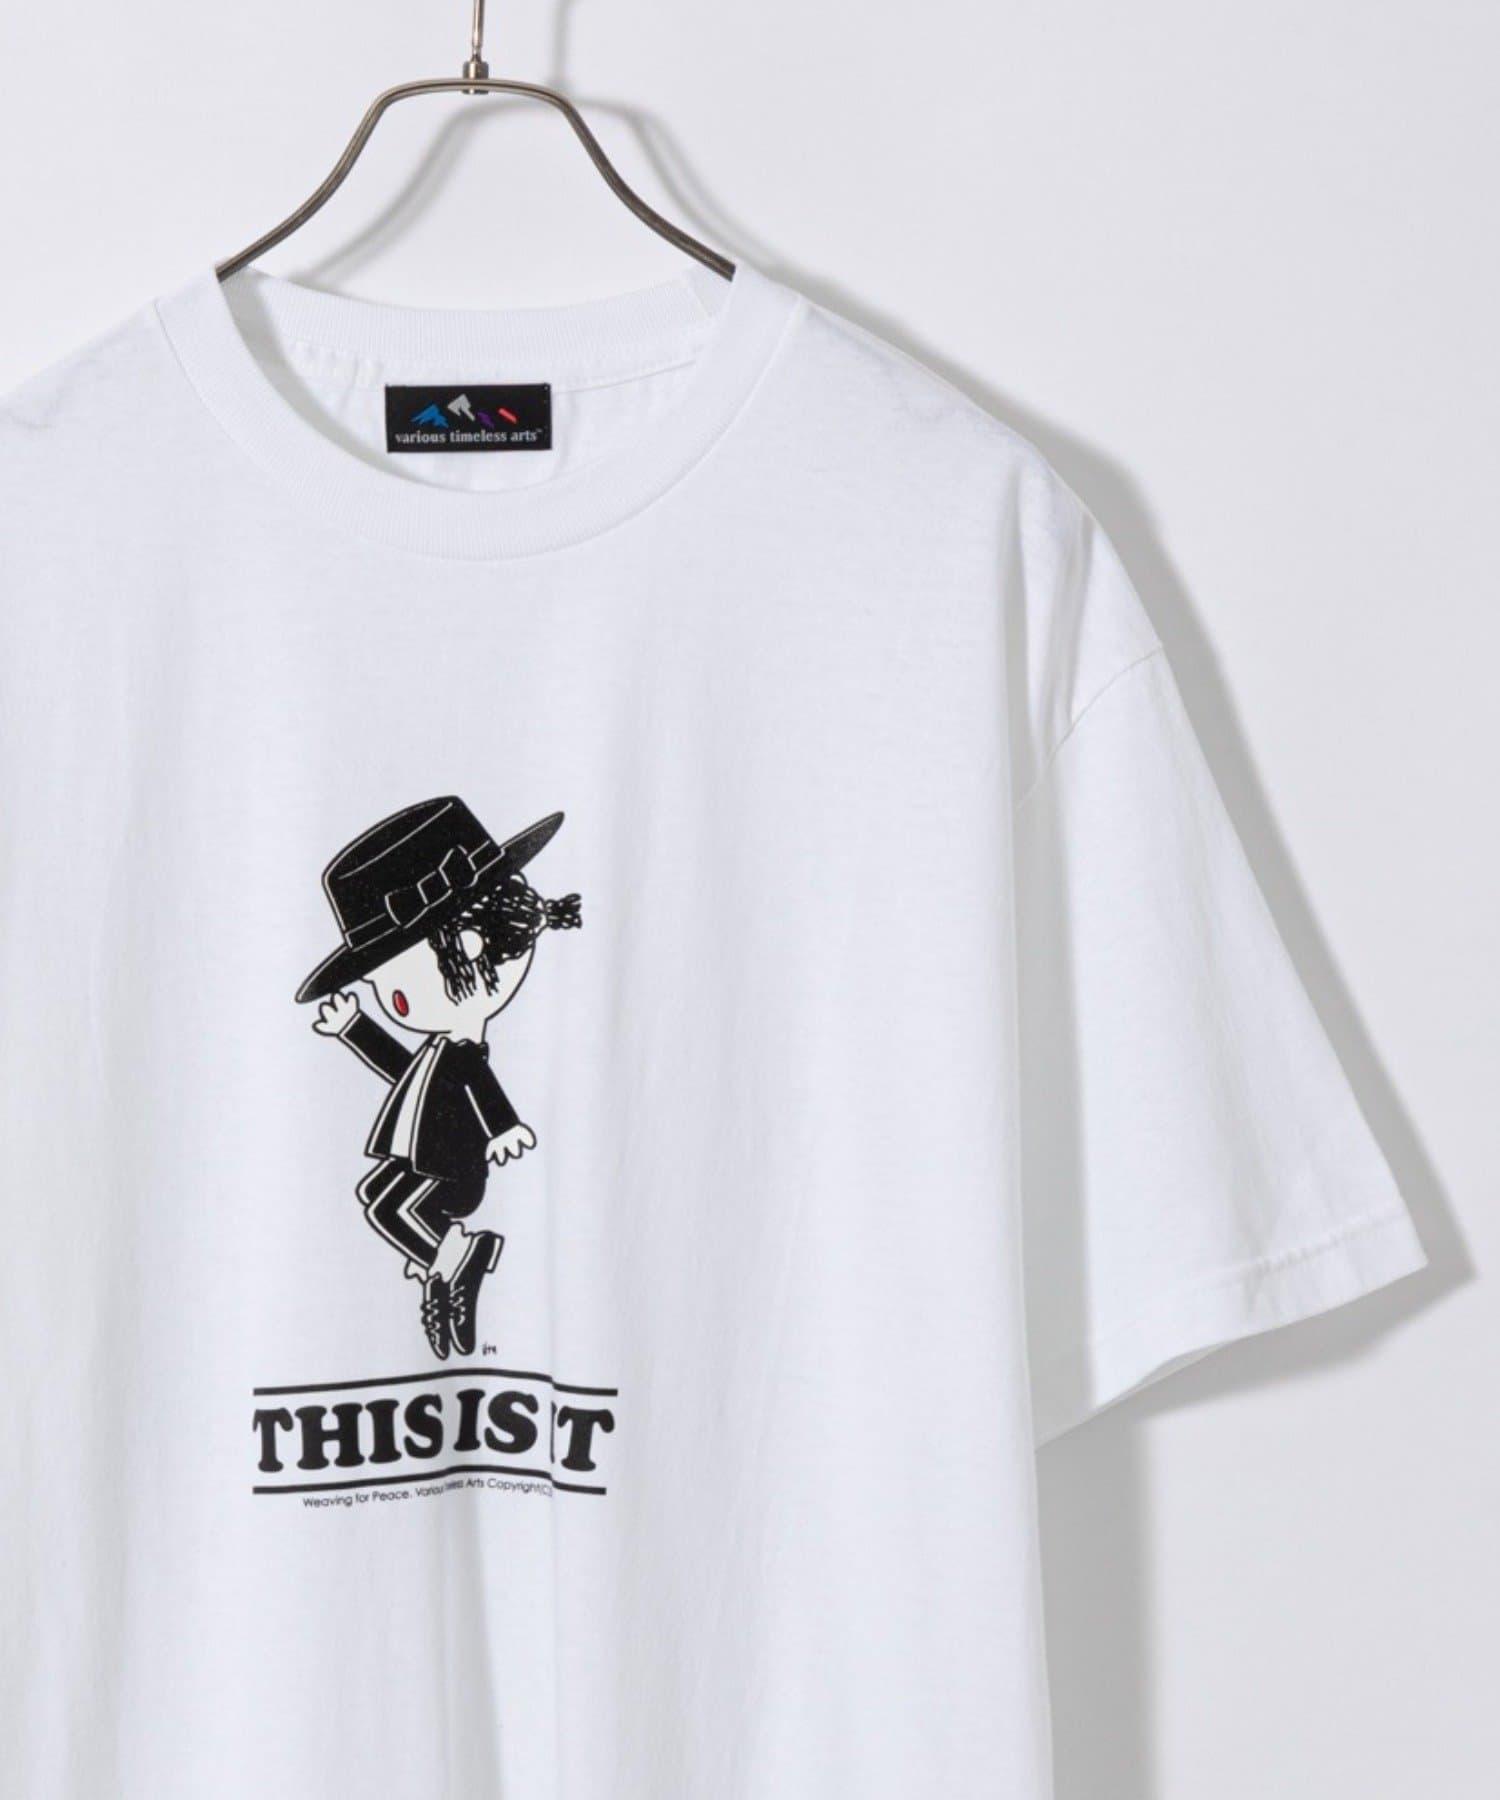 CIAOPANIC(チャオパニック) メンズ 【VARIOUS TIMELESS ARTS】トップスターM.JプリントTシャツ ホワイト